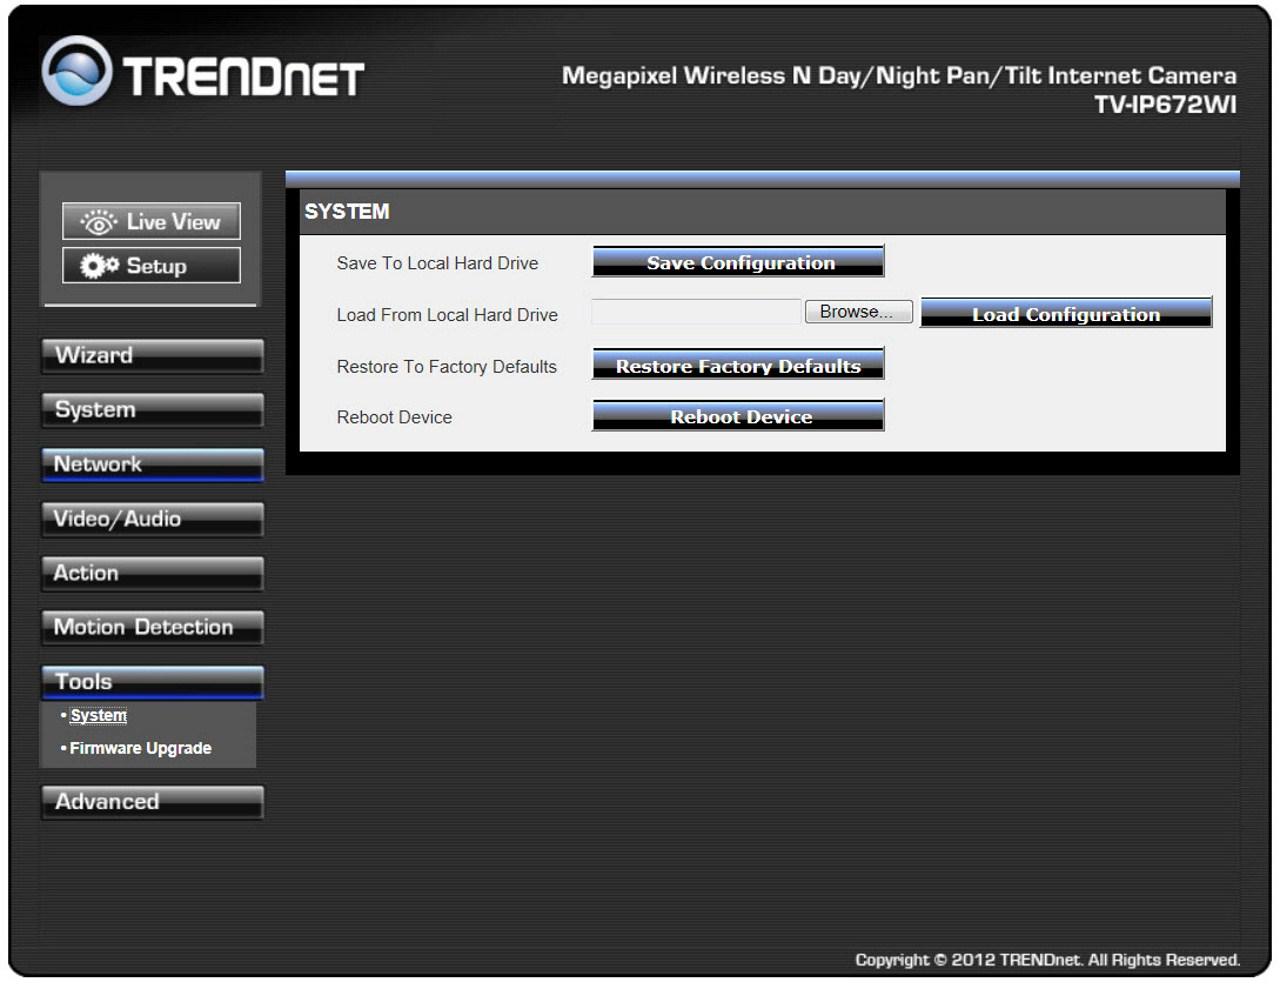 TRENDnet TV-IP672WI Megapixel Wireless Day/Night PTZ IP ...